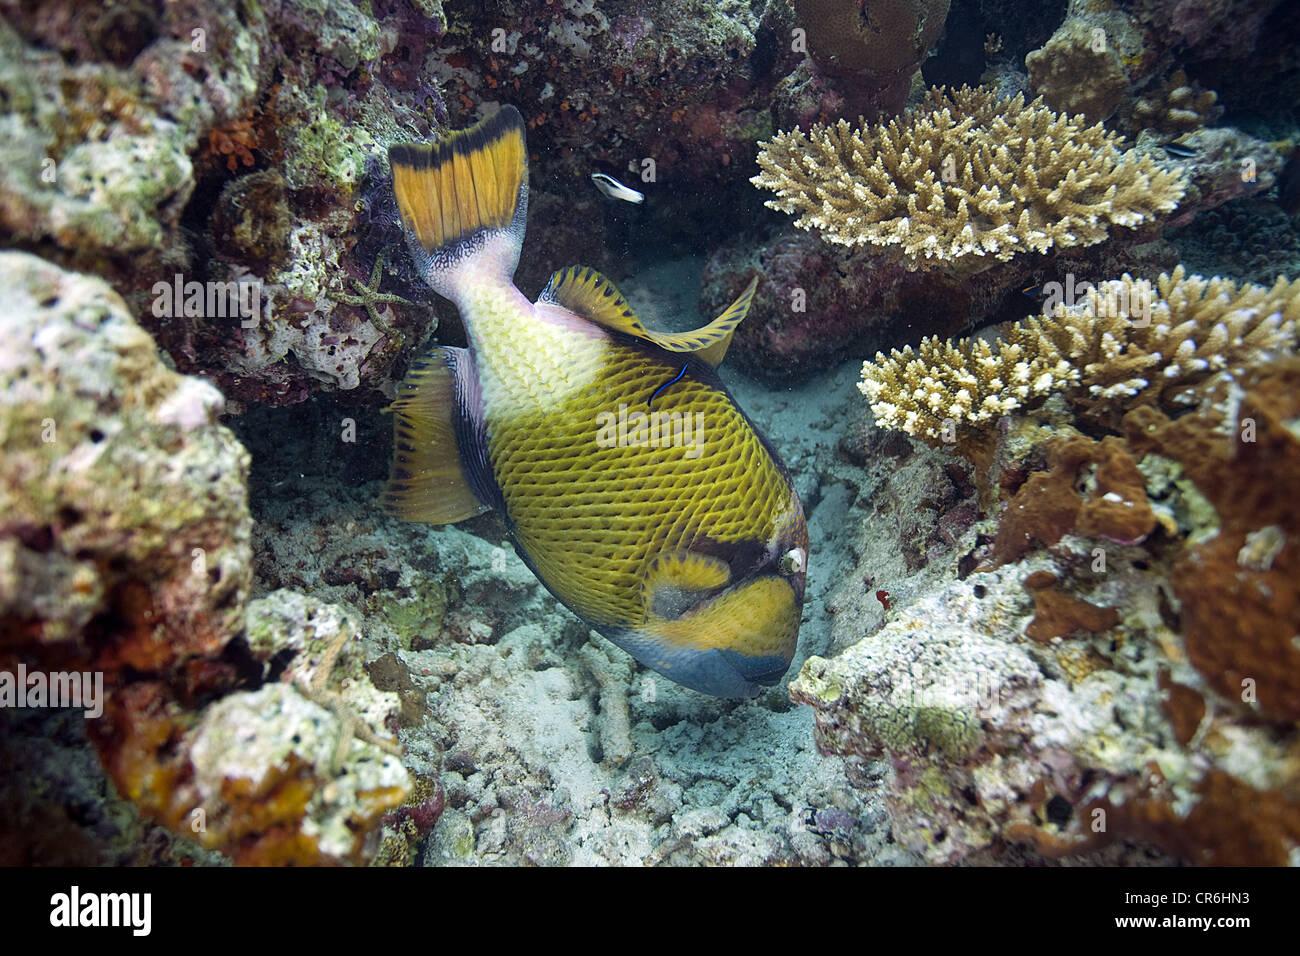 Giant trigger fish (Balistoides viridescens), Maldives, Indian Ocean, Asia - Stock Image